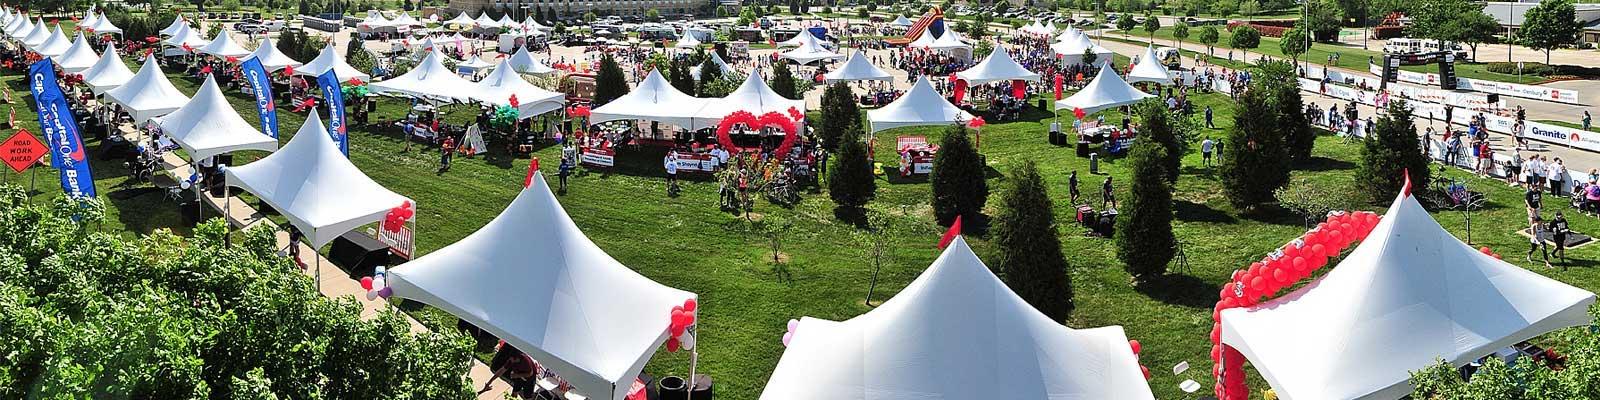 Tent Rentals In Dallas Tx Canopy Rental Amp Wedding